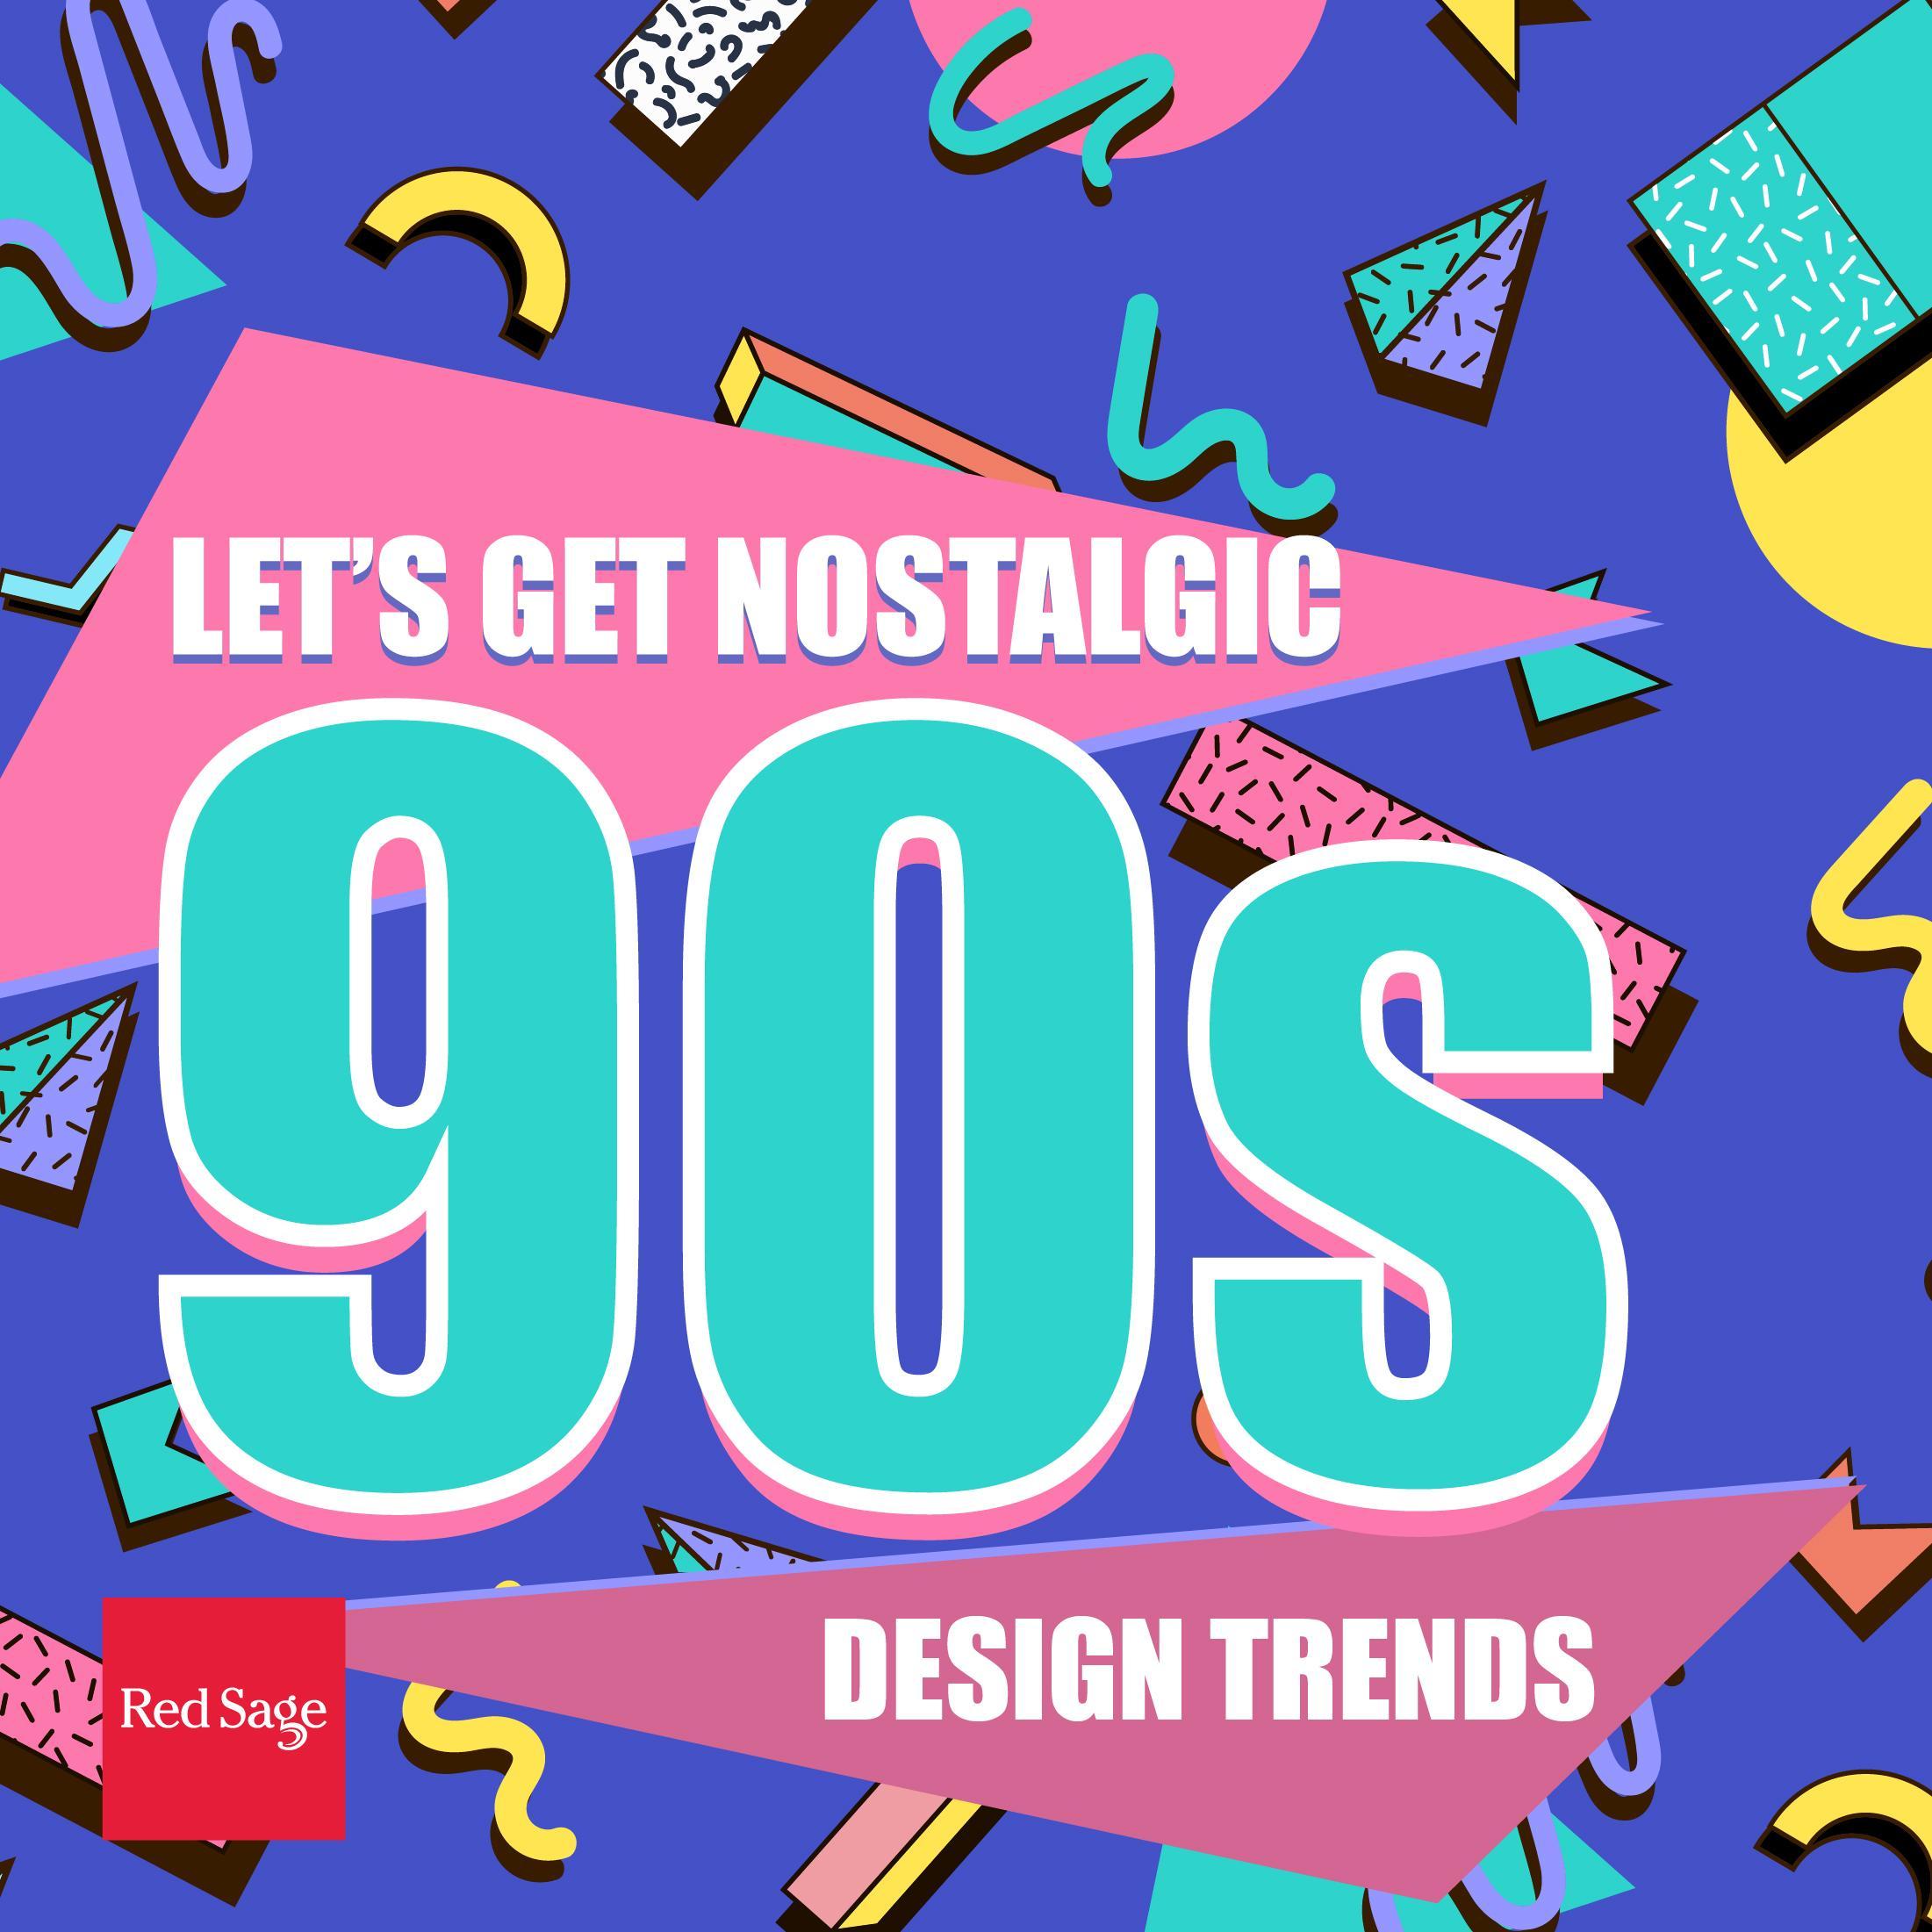 90s-nostalgic-blog-graphic-01-01-01.jpg